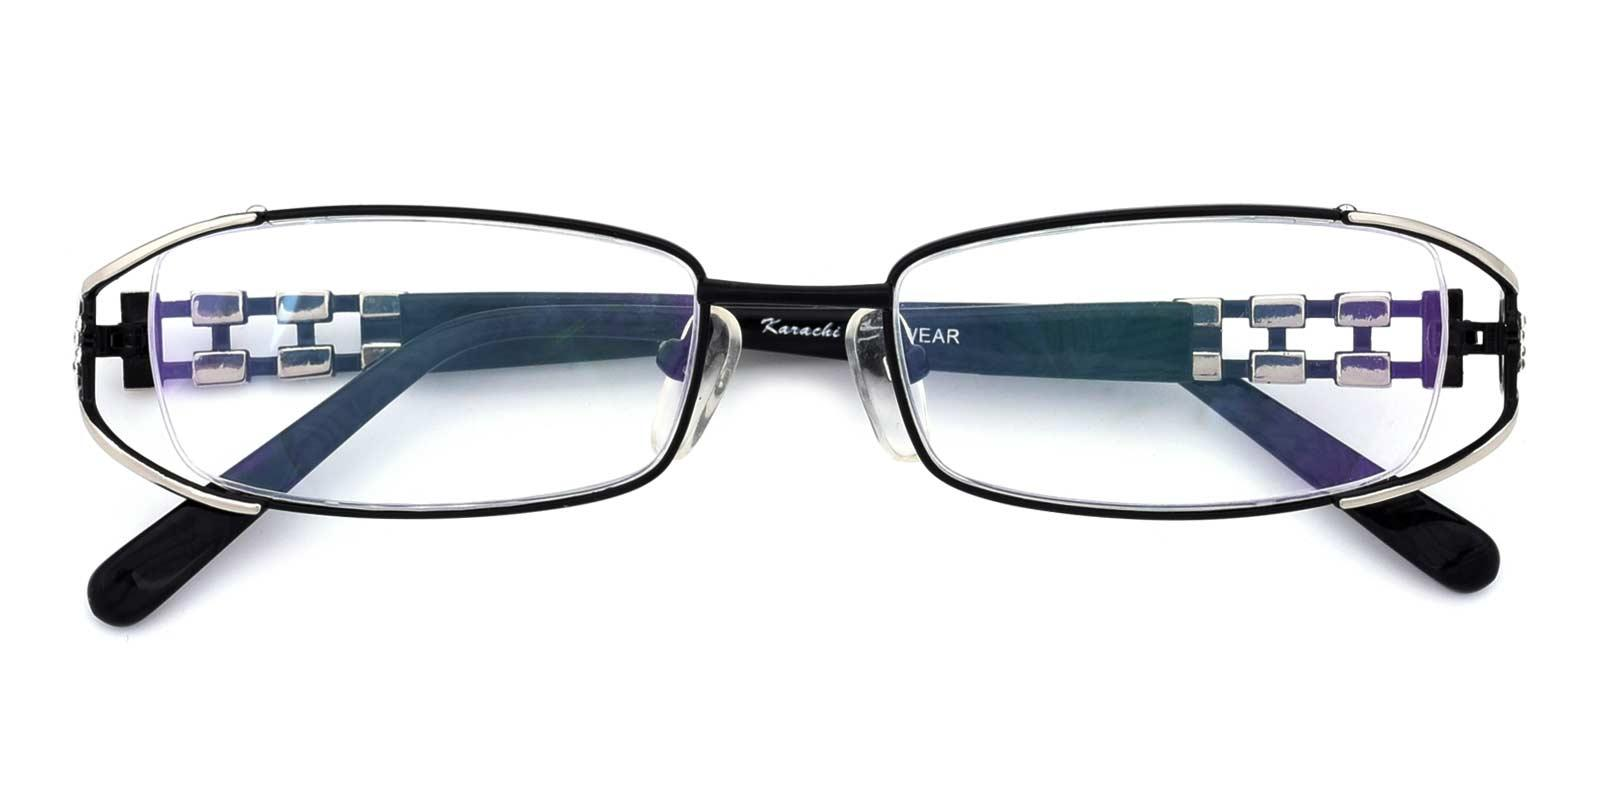 Kaki-Black-Rectangle-Metal-Eyeglasses-detail